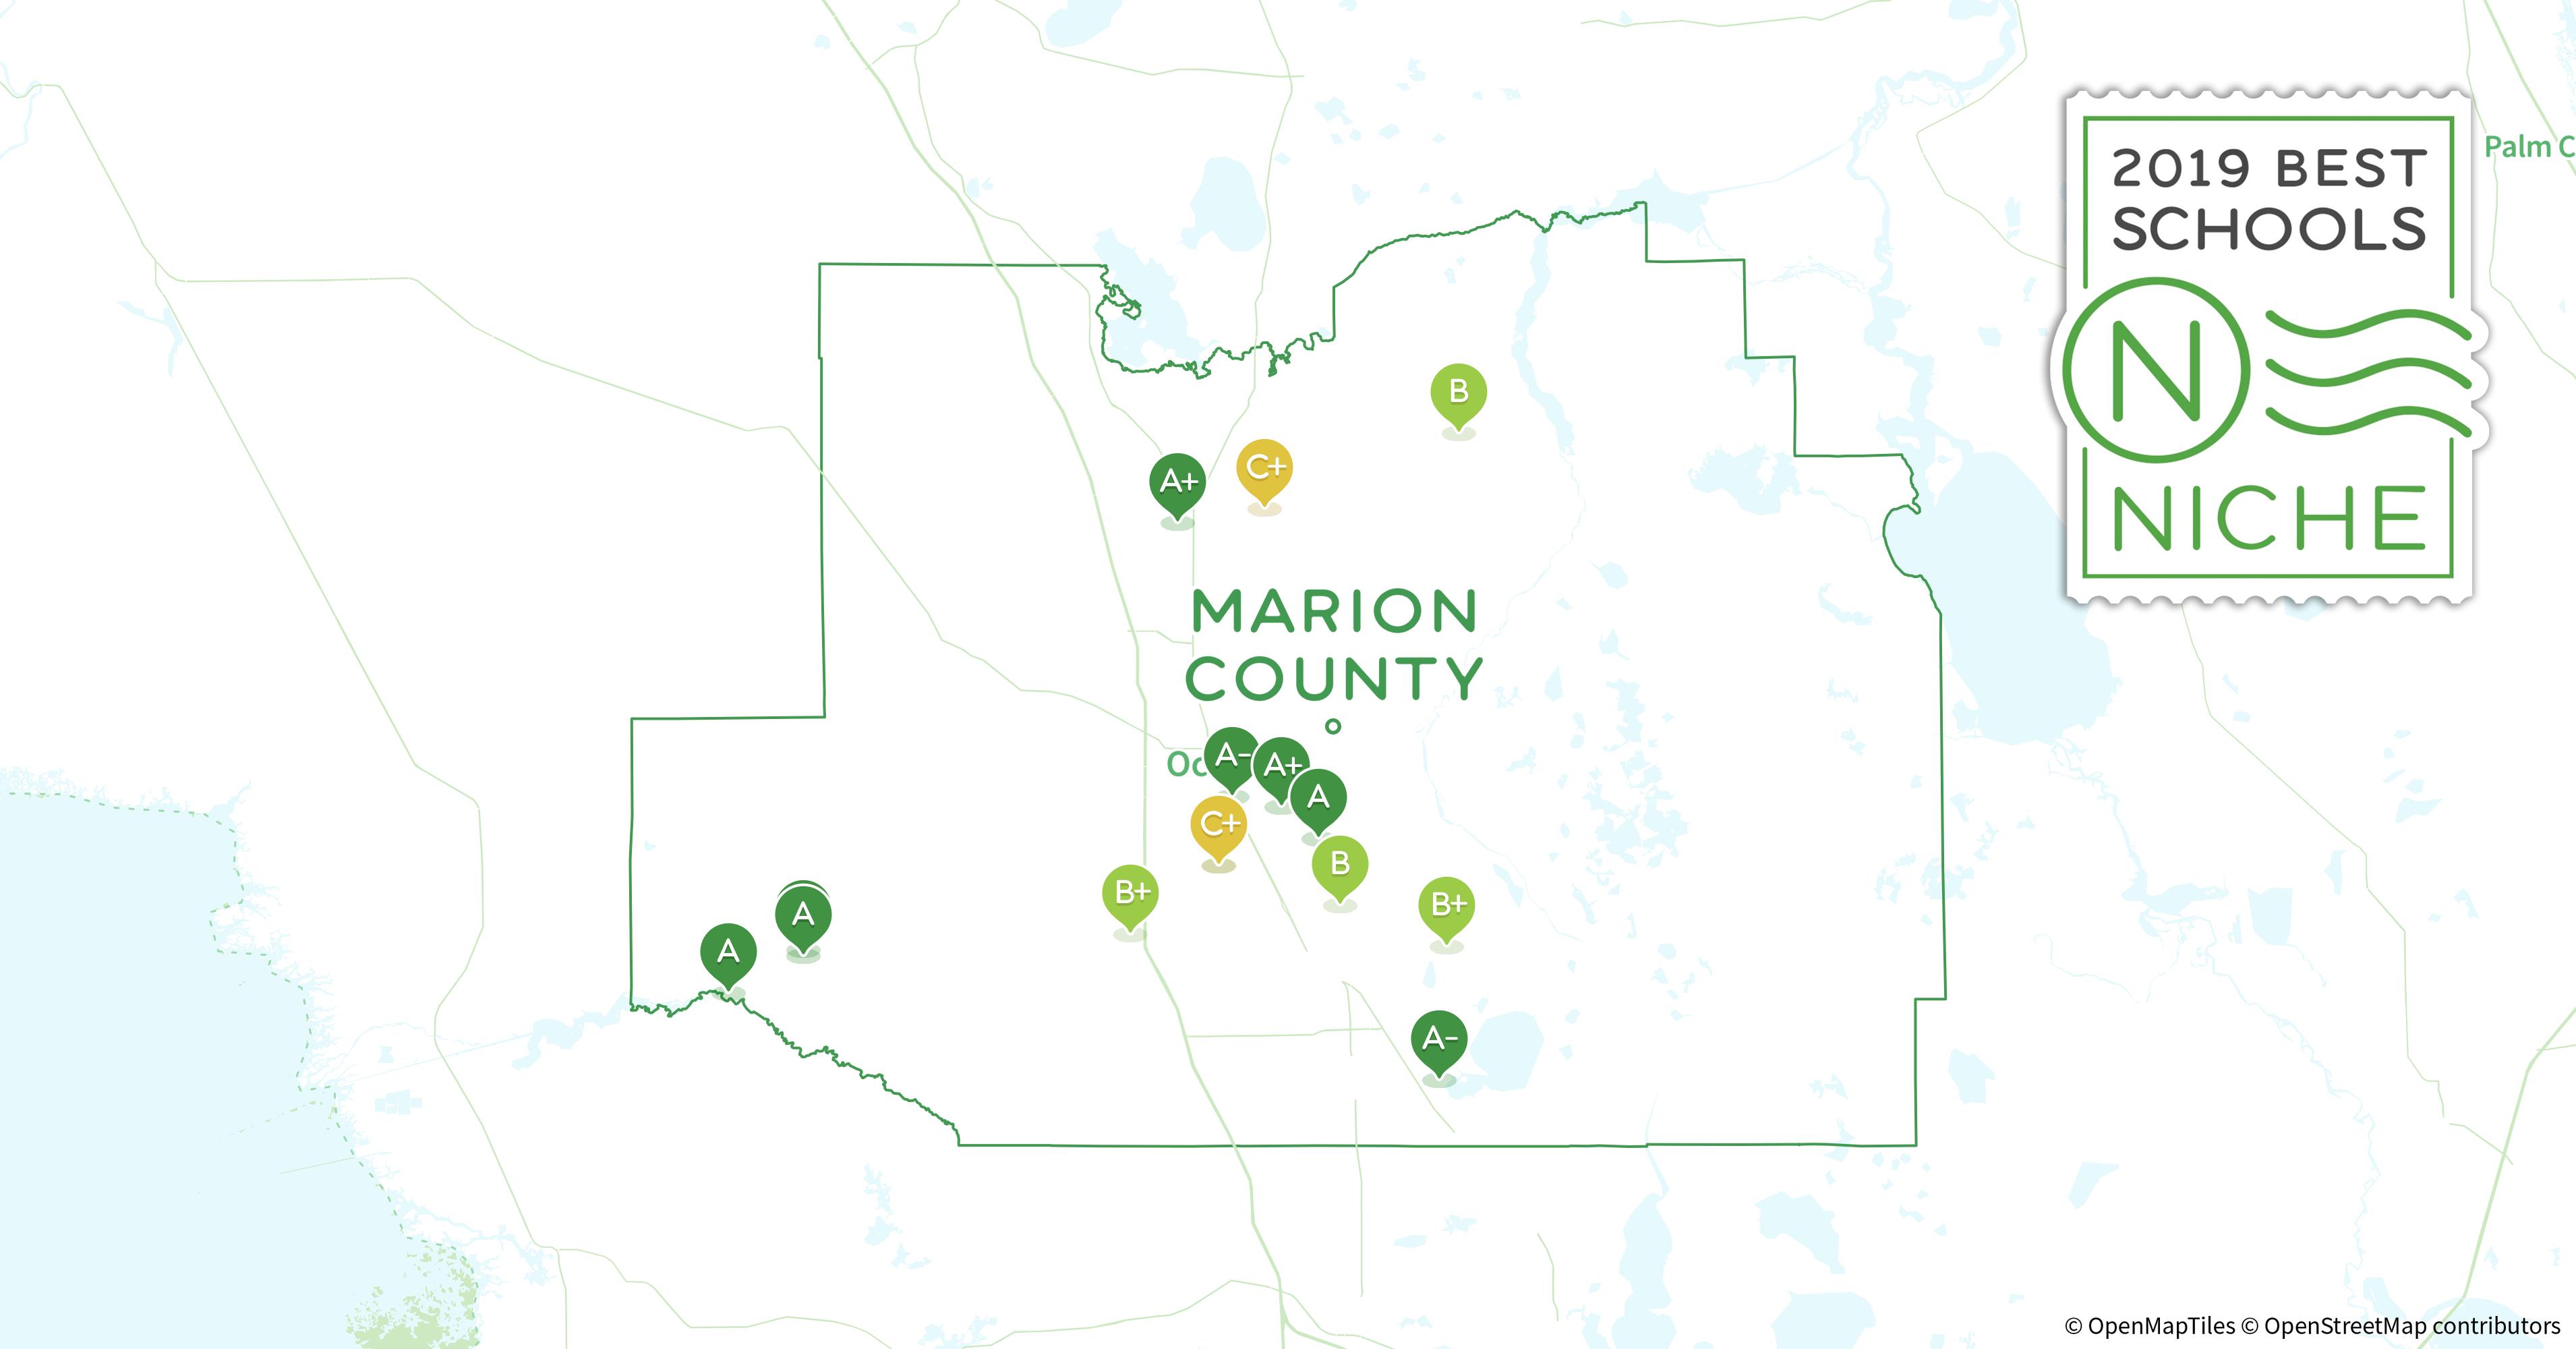 2019 Best Public Elementary Schools In Marion County Fl Niche